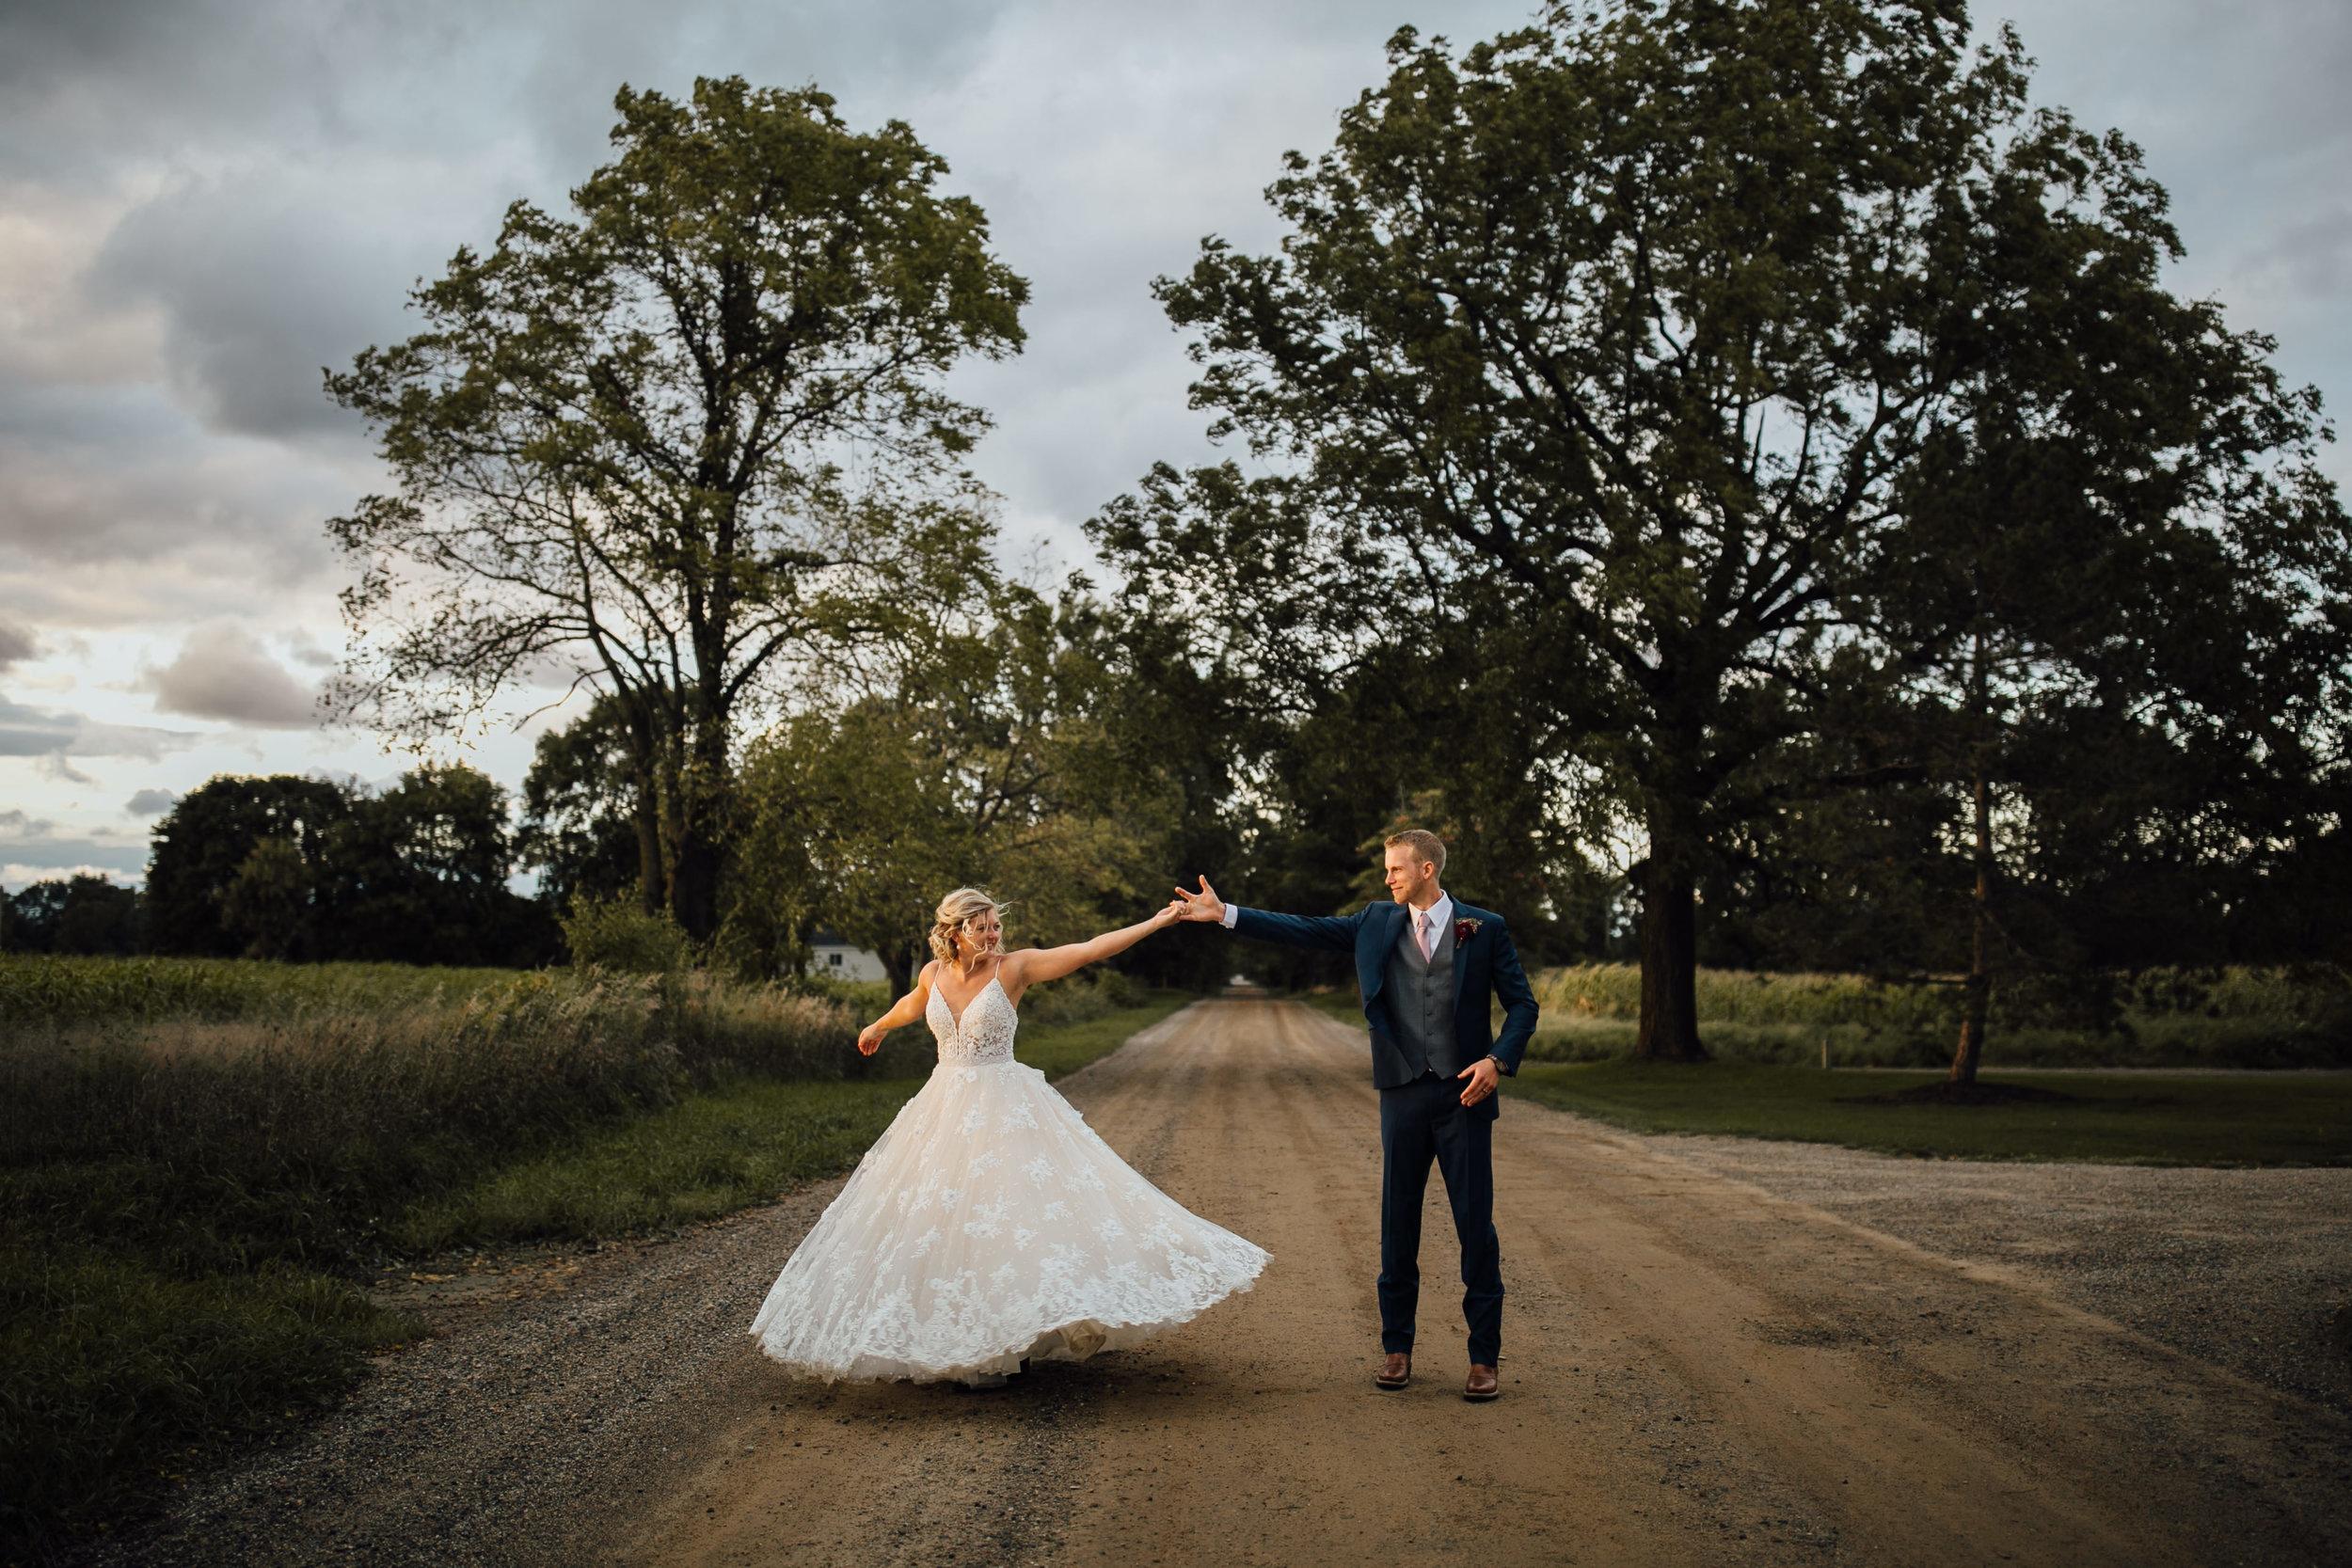 2018-9-Tessa-Aaron-Preview-Wildwood-Family-Farms-Wedding-Michigan-Wedding-Photographer-184.jpg